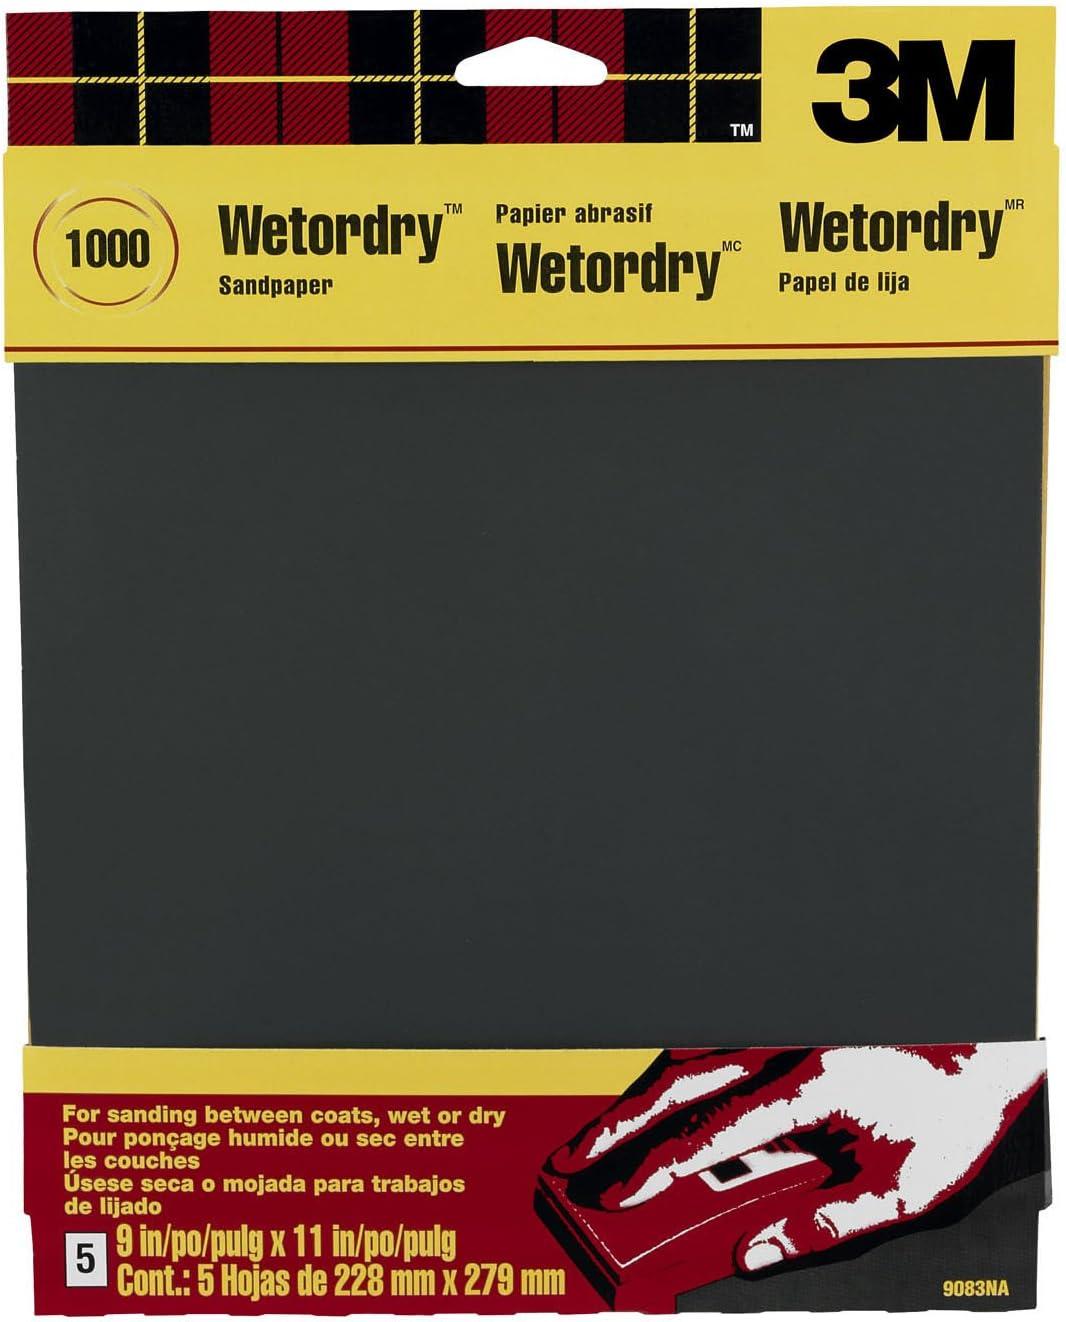 3M Wetordry Sandpaper, 1000-Grit, 9-Inch by 11-Inch, 5 Sheets - 9083NA-20,Black 71u6lkm2xRL